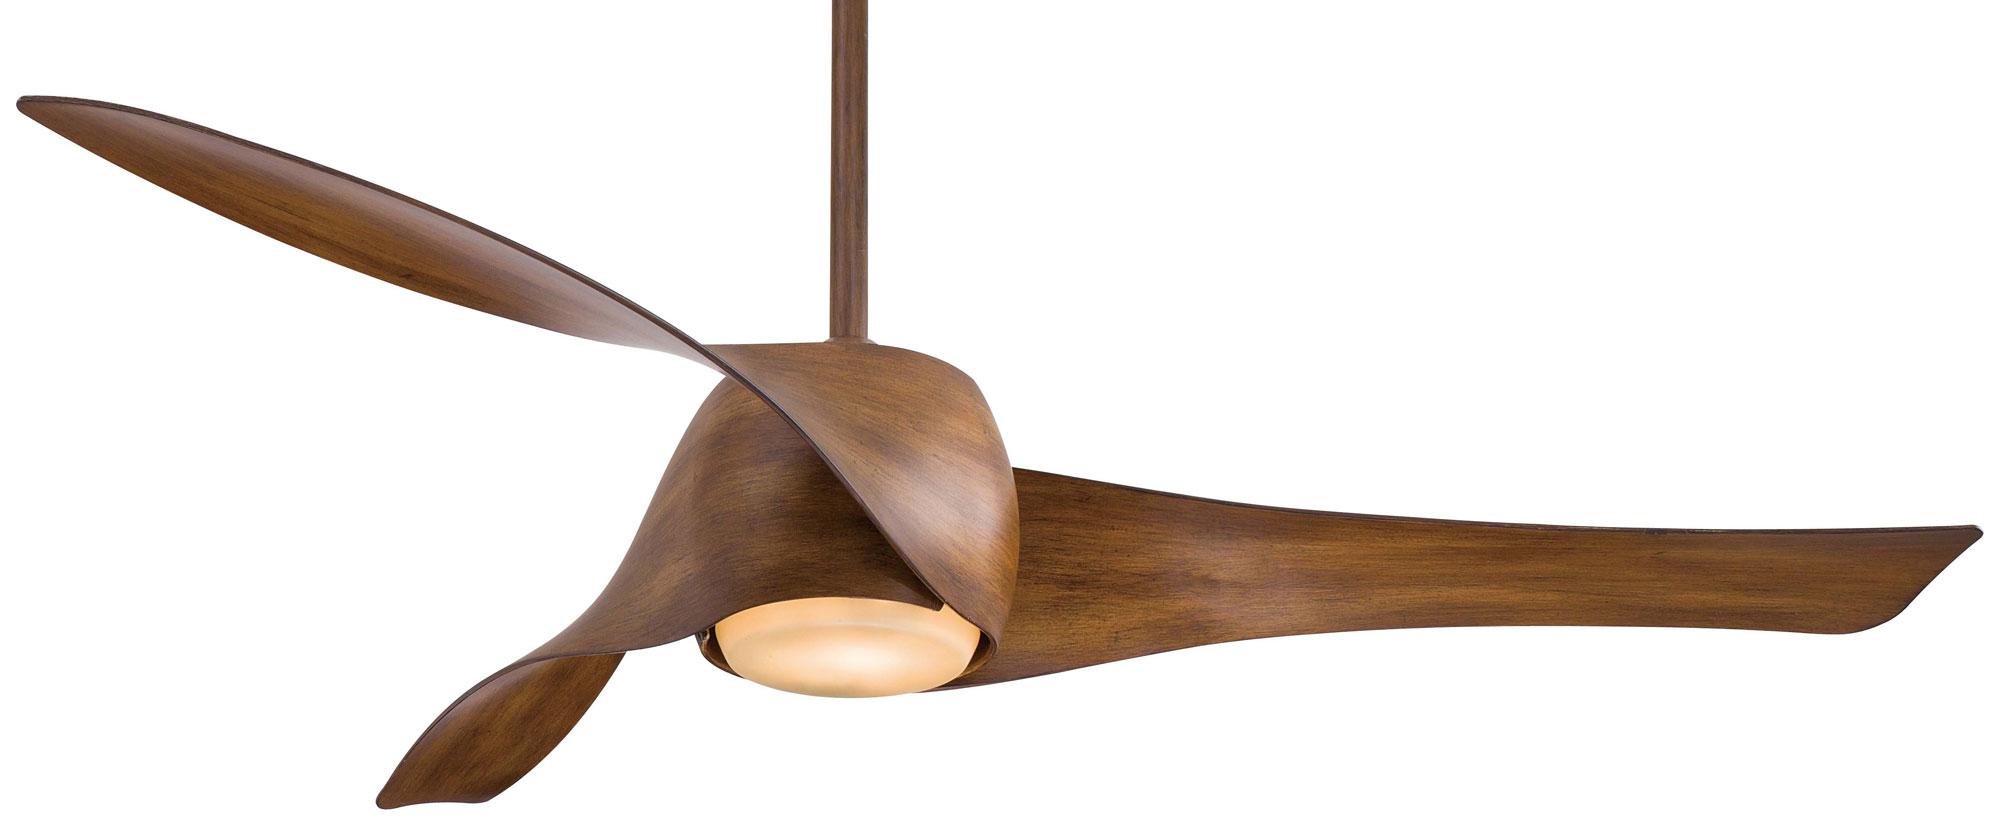 wooden-ceiling-fans-photo-10